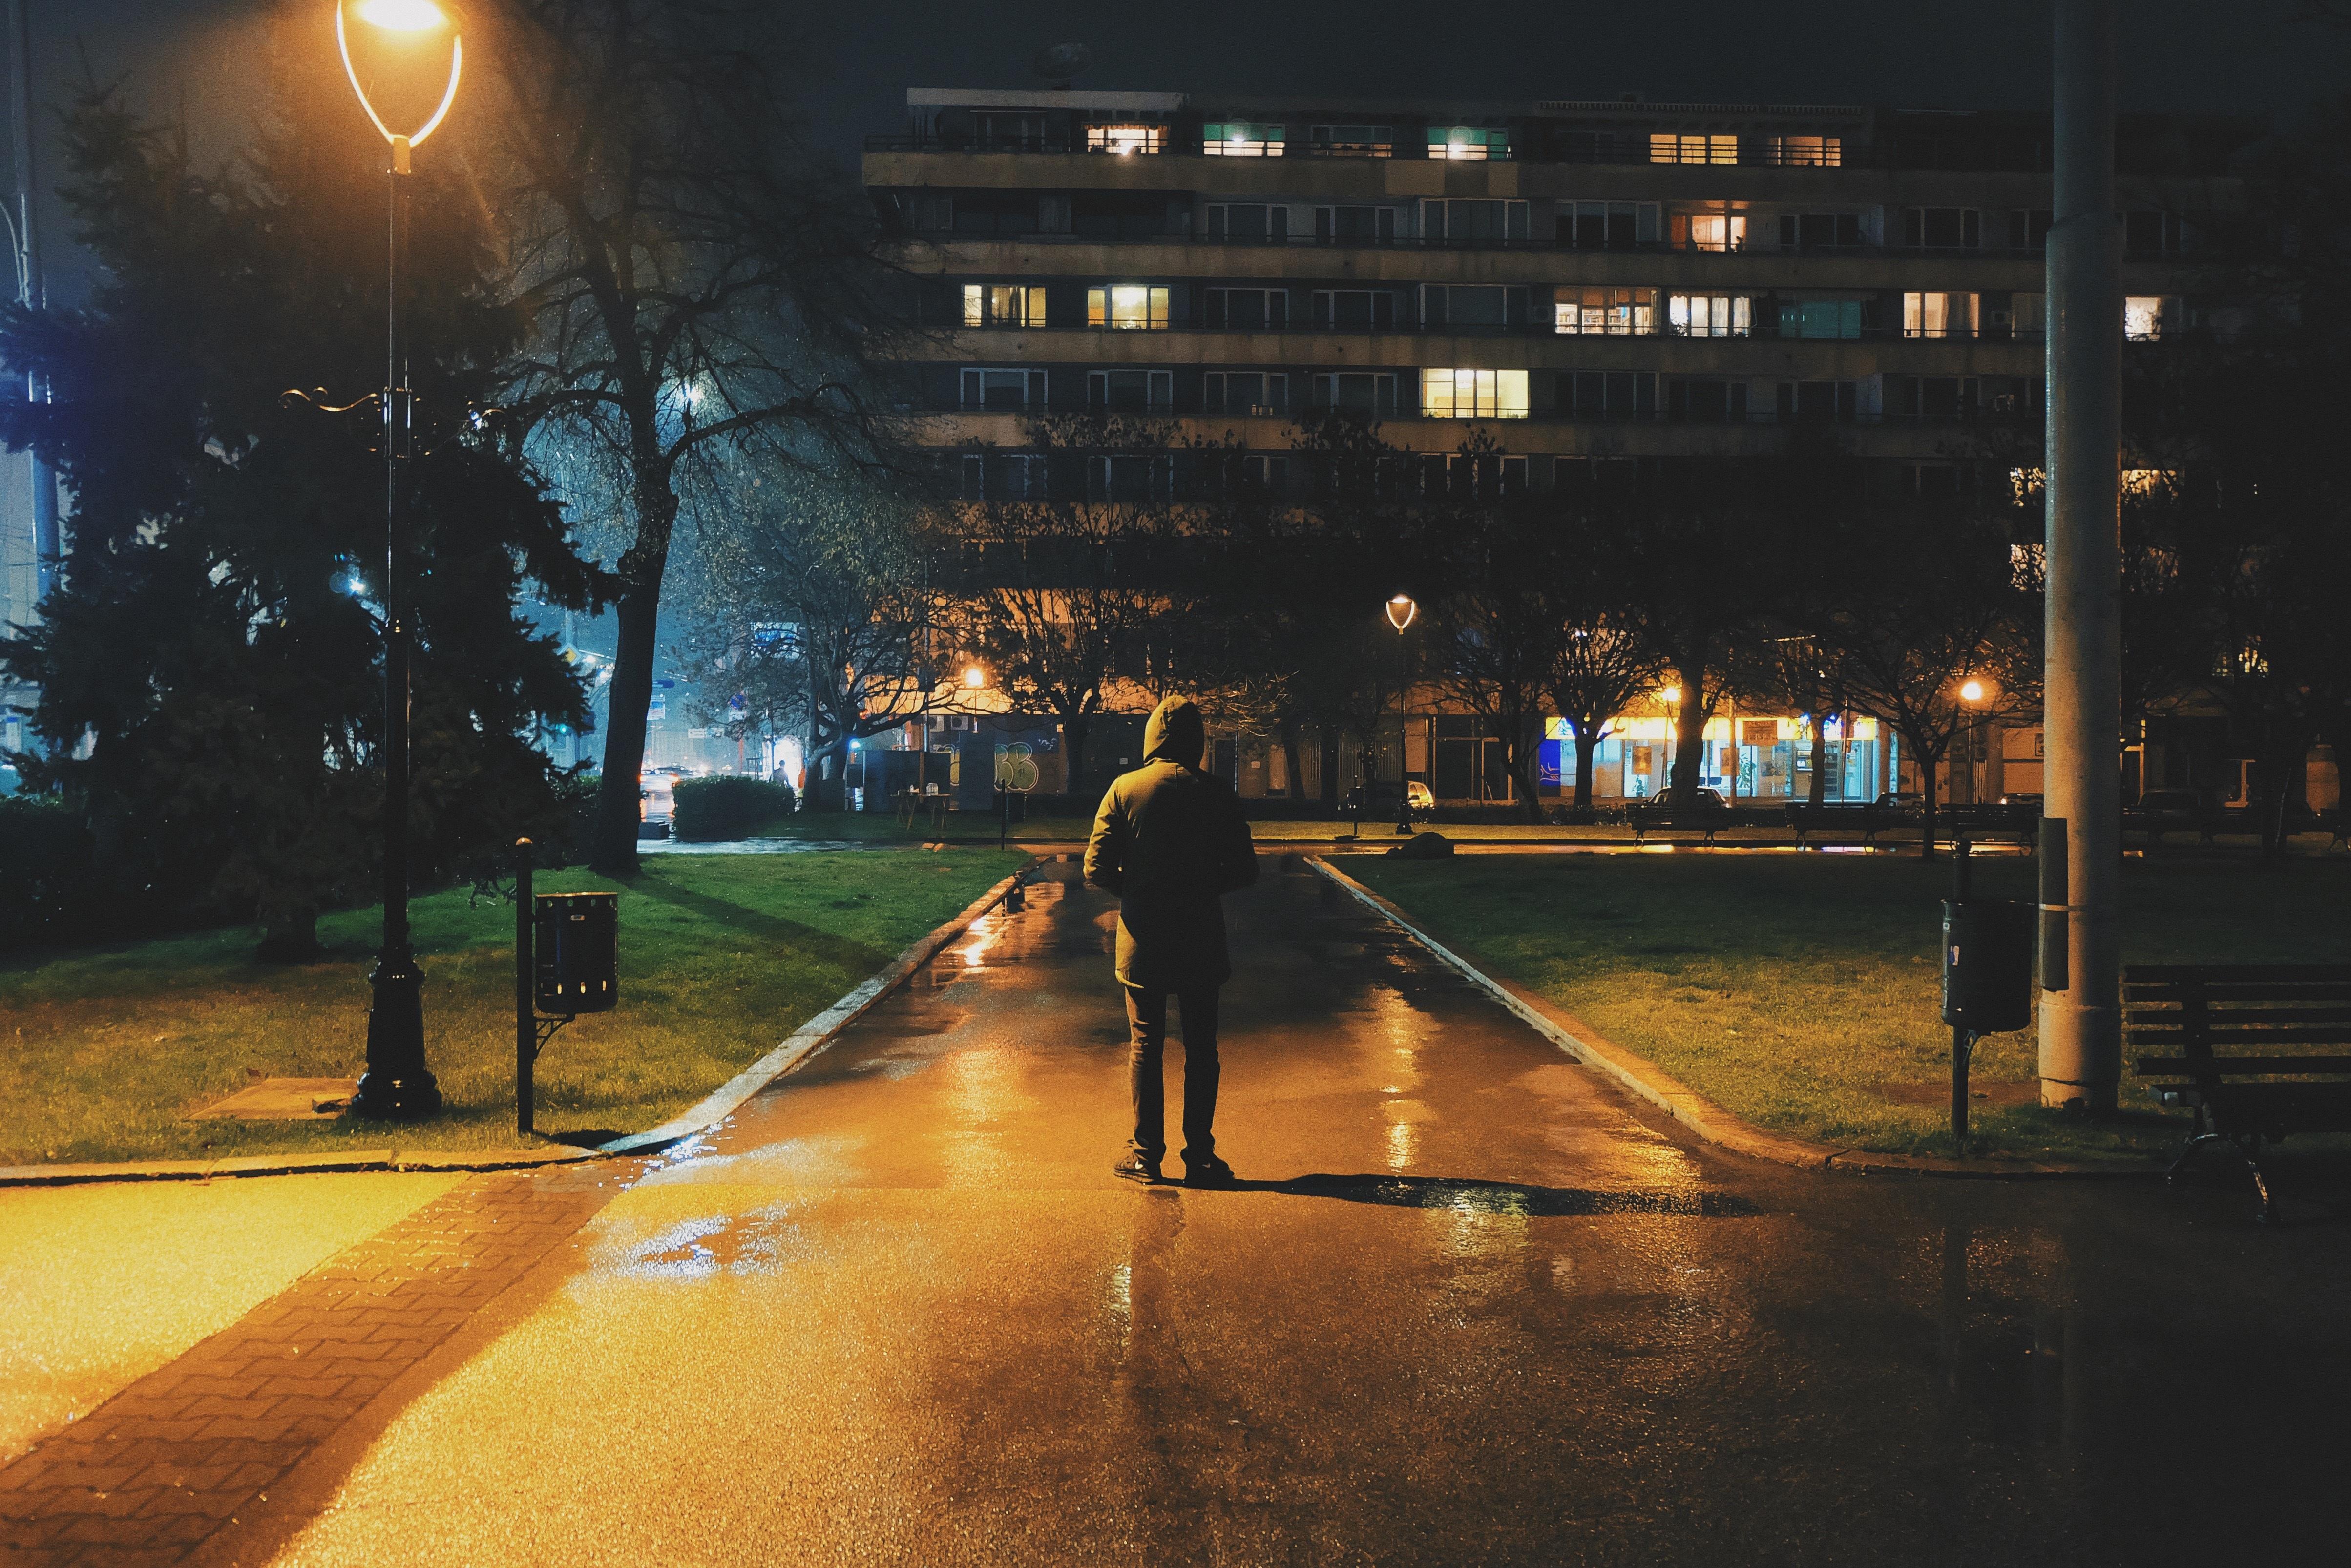 wet alone